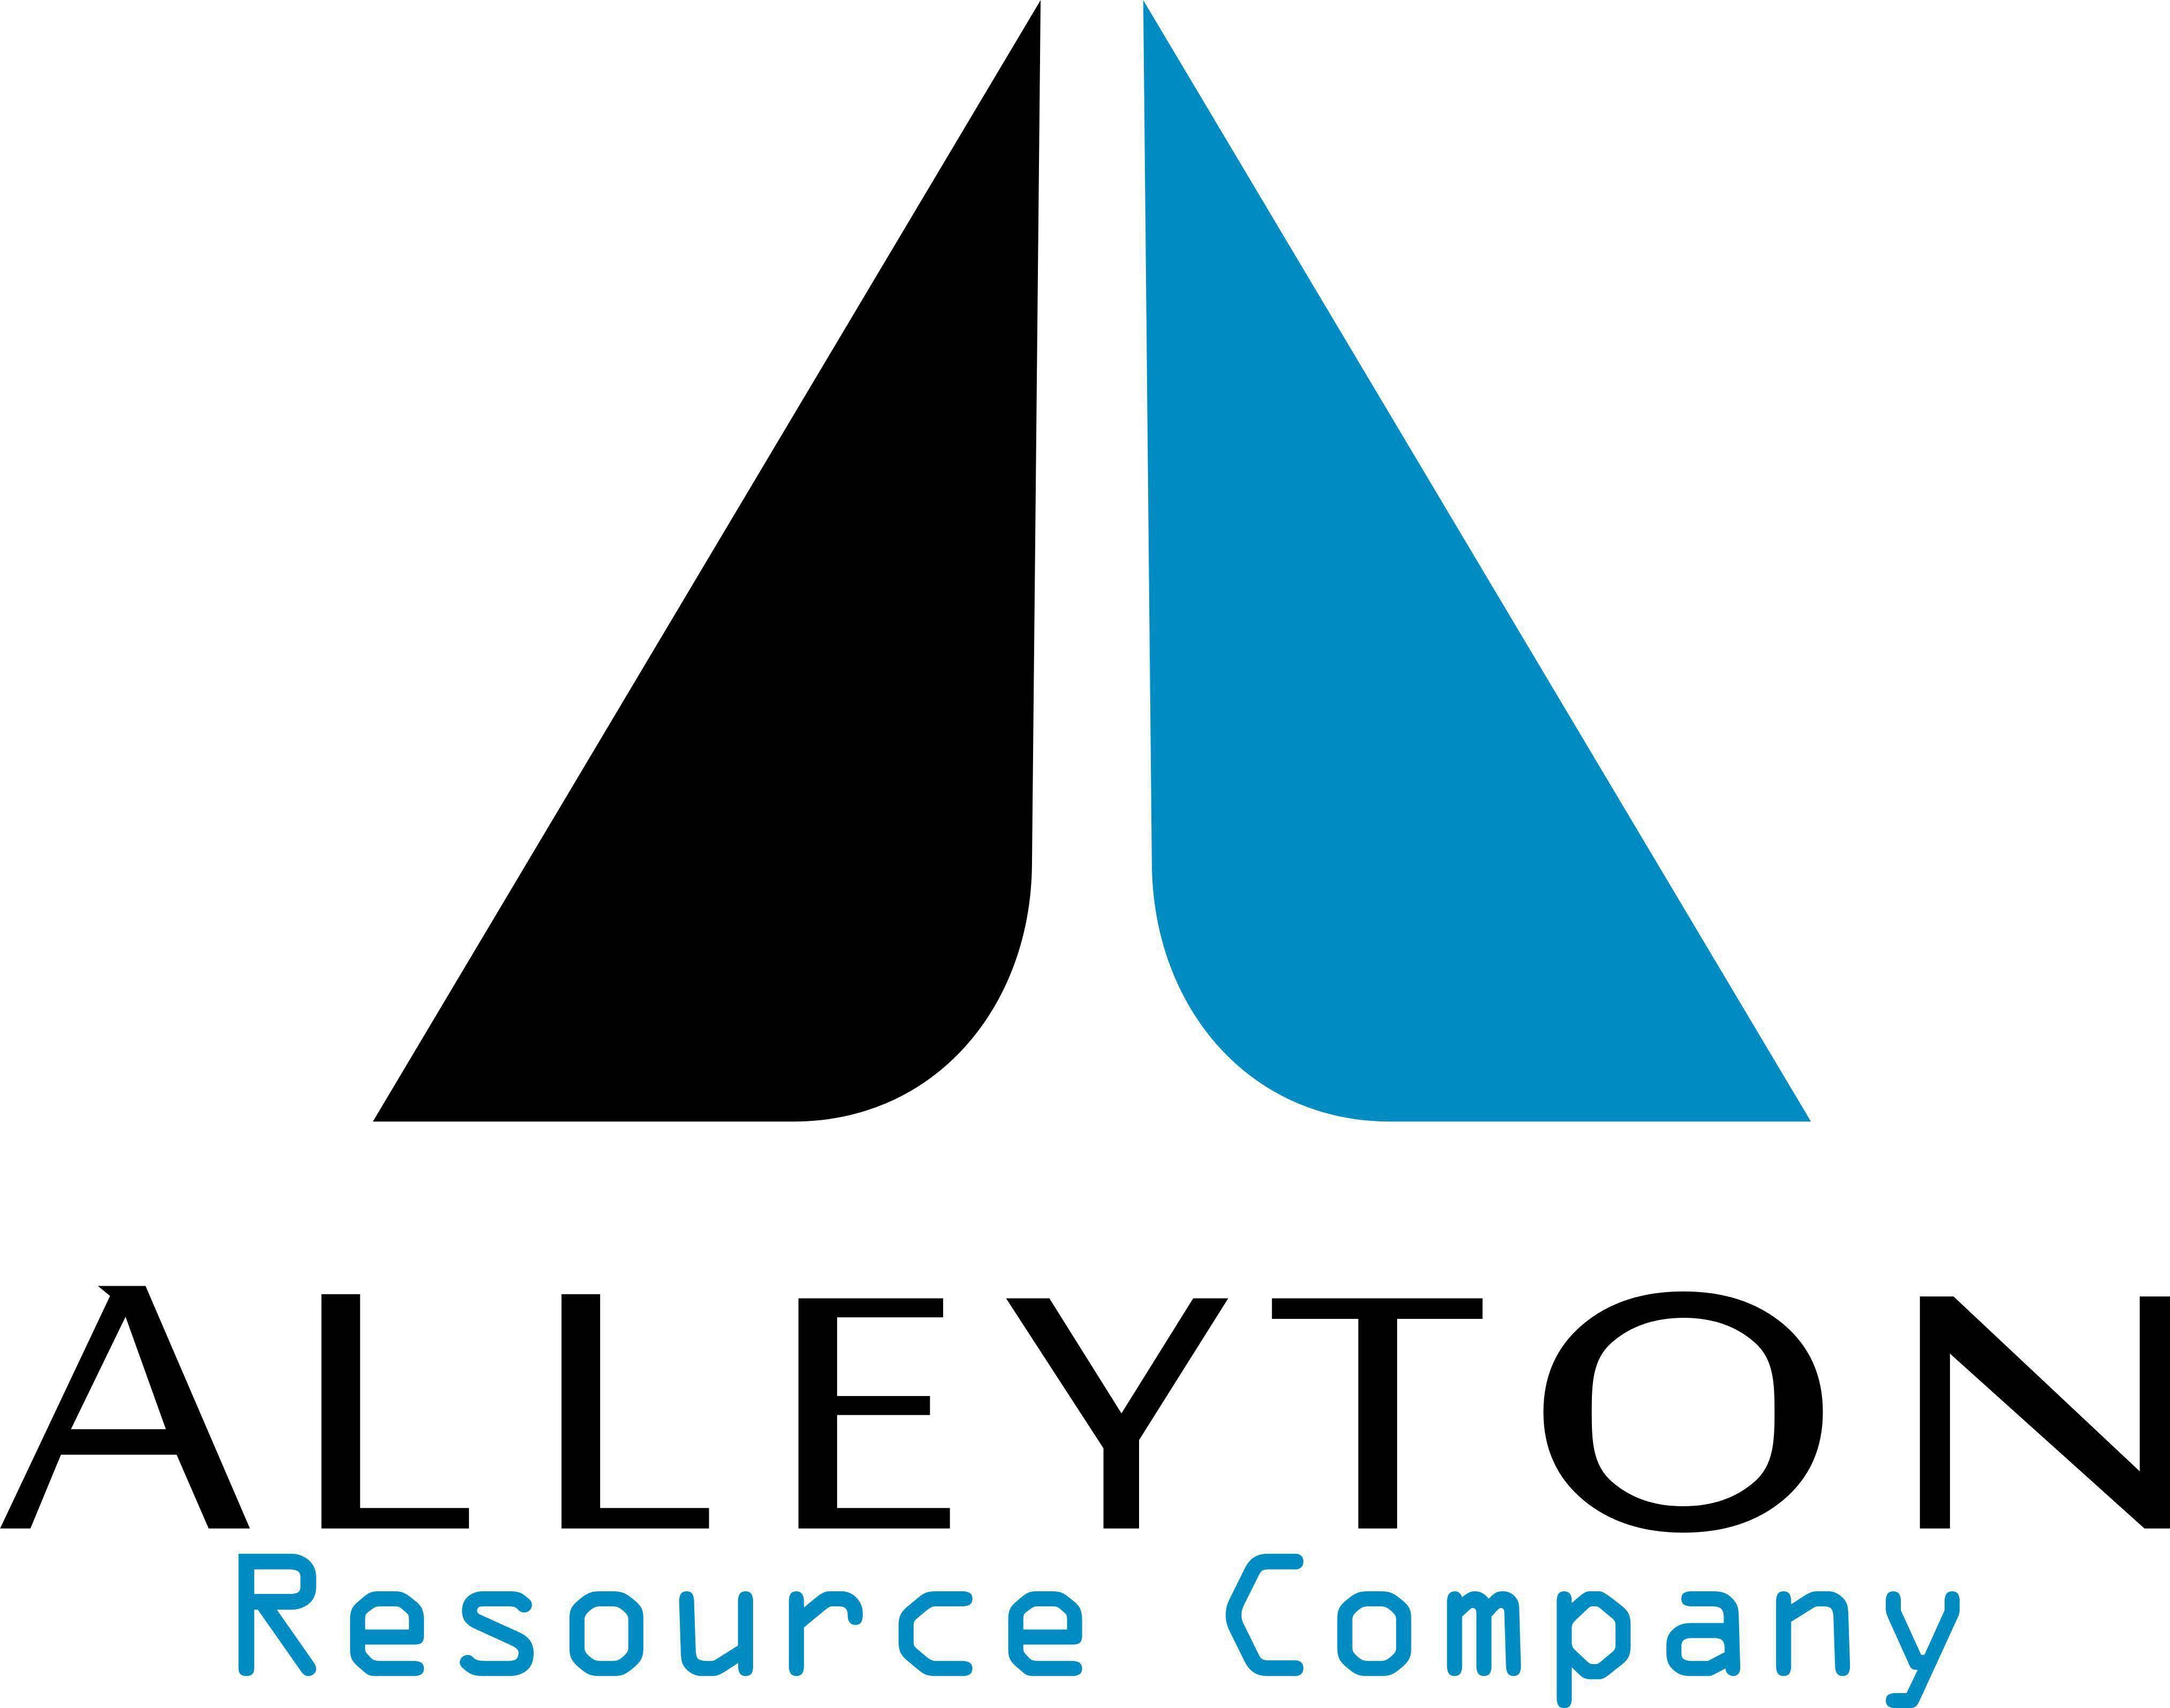 AlleytonLogo